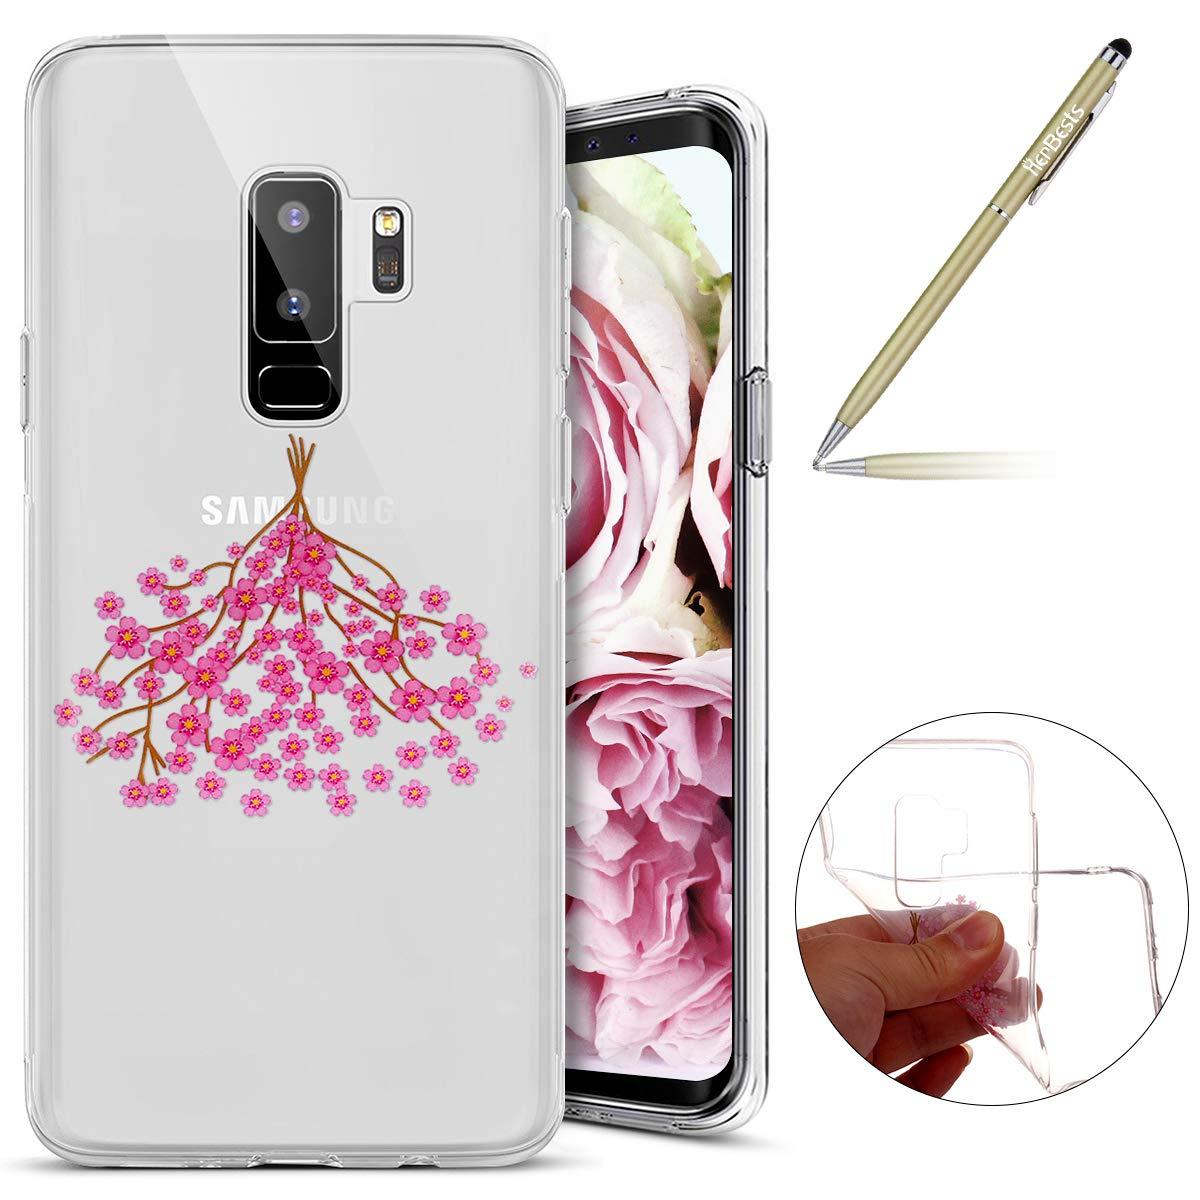 Für Samsung Galaxy S9 Plus Hülle, Durchsichtige Schutzhülle für Samsung Galaxy S9 Plus, Samsung Galaxy S9 Plus Silikon Hülle Blumen, Herbests Schönes Bunte Kirschblüten Rosa Blumen Floral Handyhülle Ultra Slim Crystal Clear Silikonhülle Schutzhülle TPU Kir